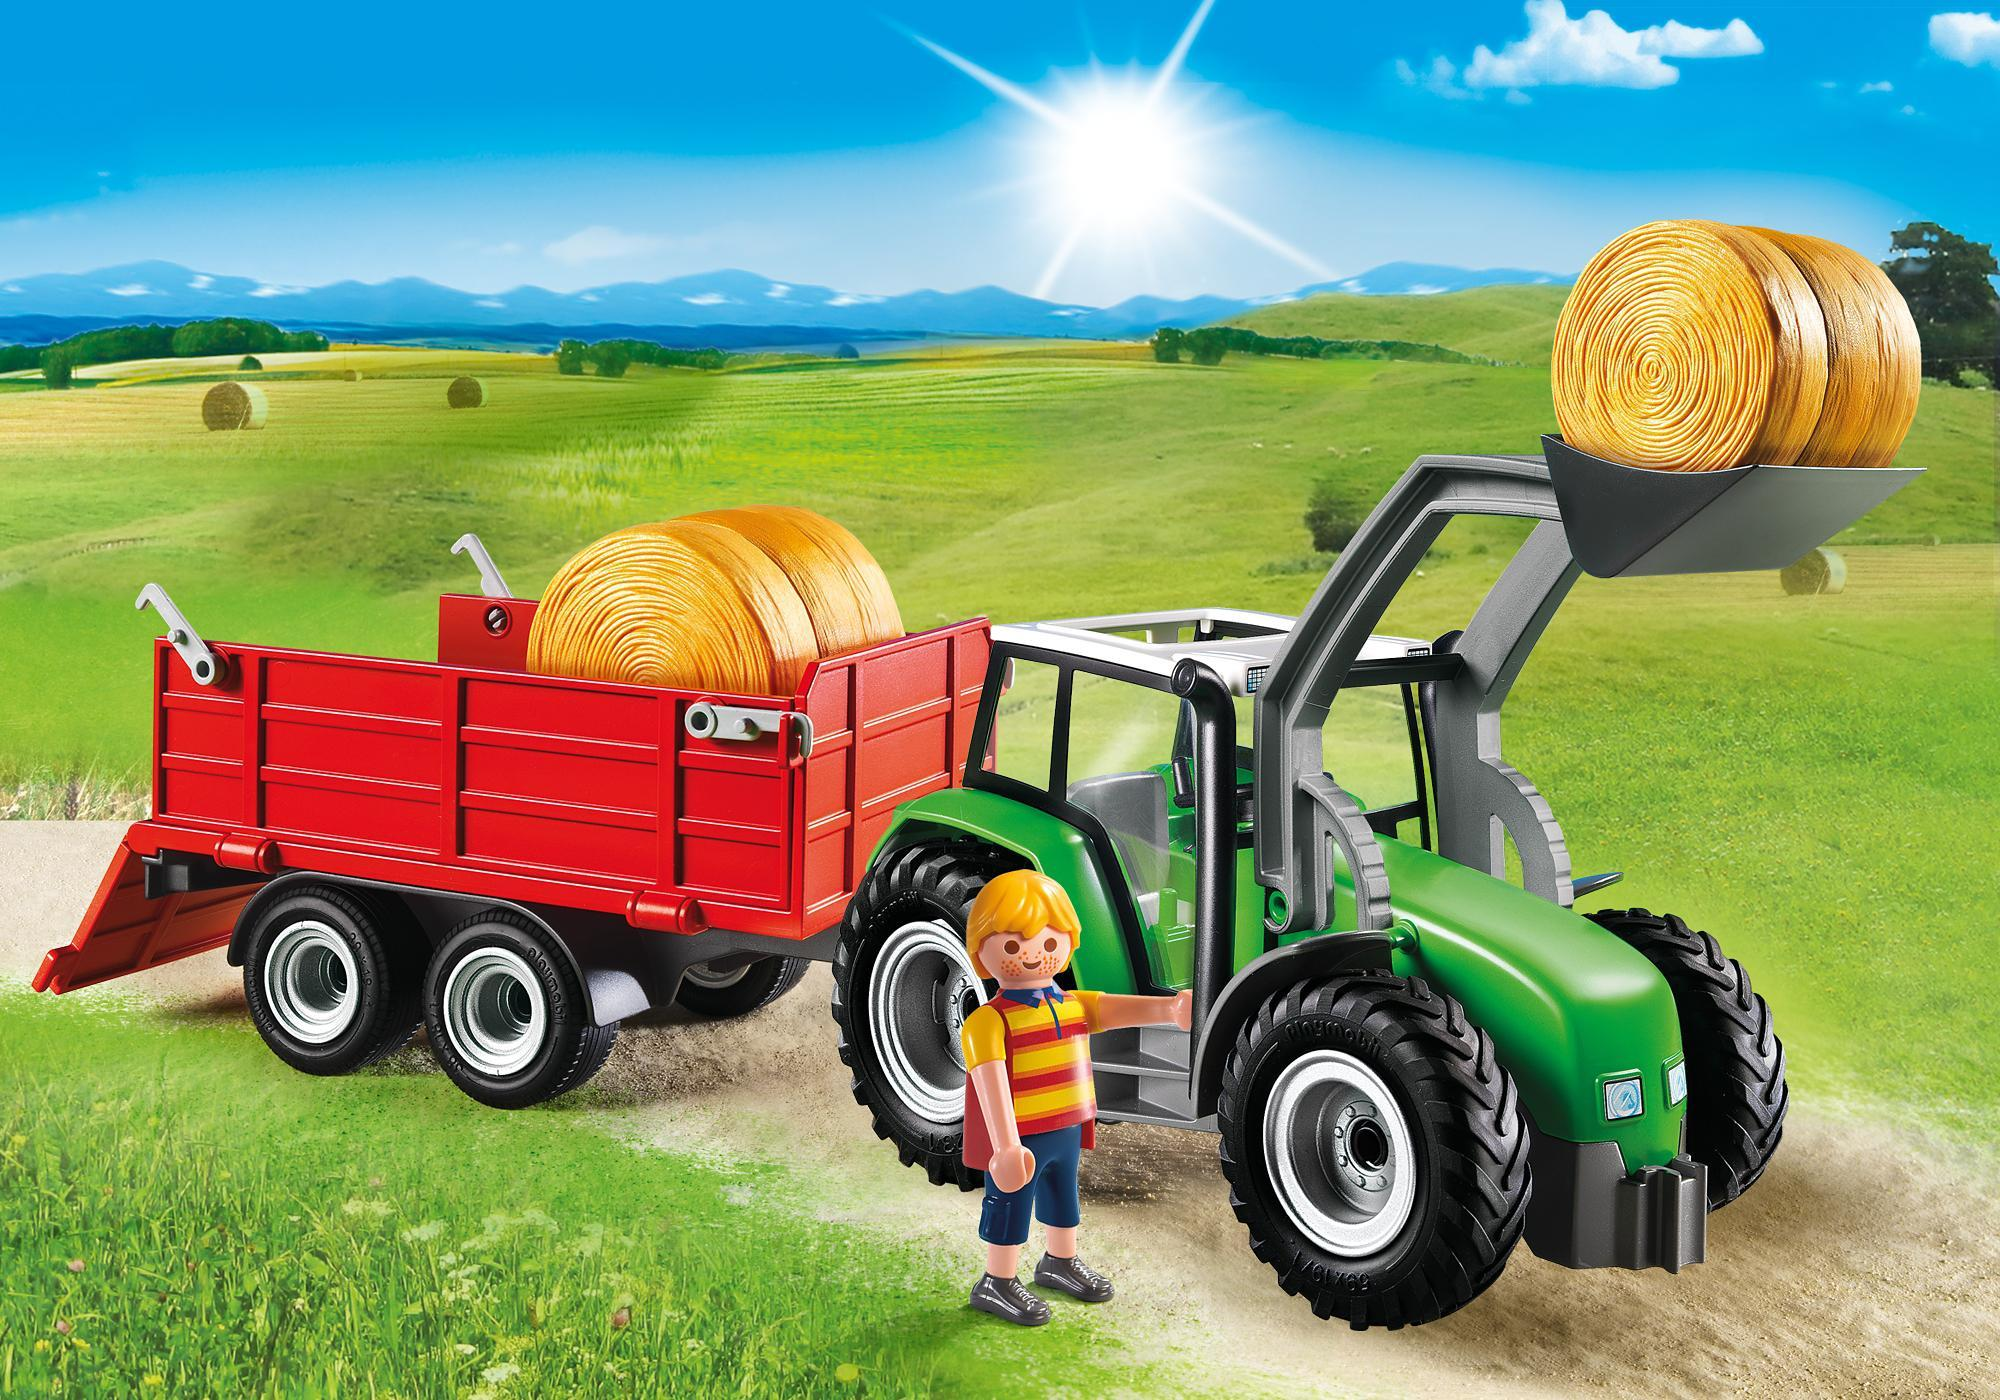 Frontlader Playmobil : Großer traktor mit anhänger playmobil deutschland